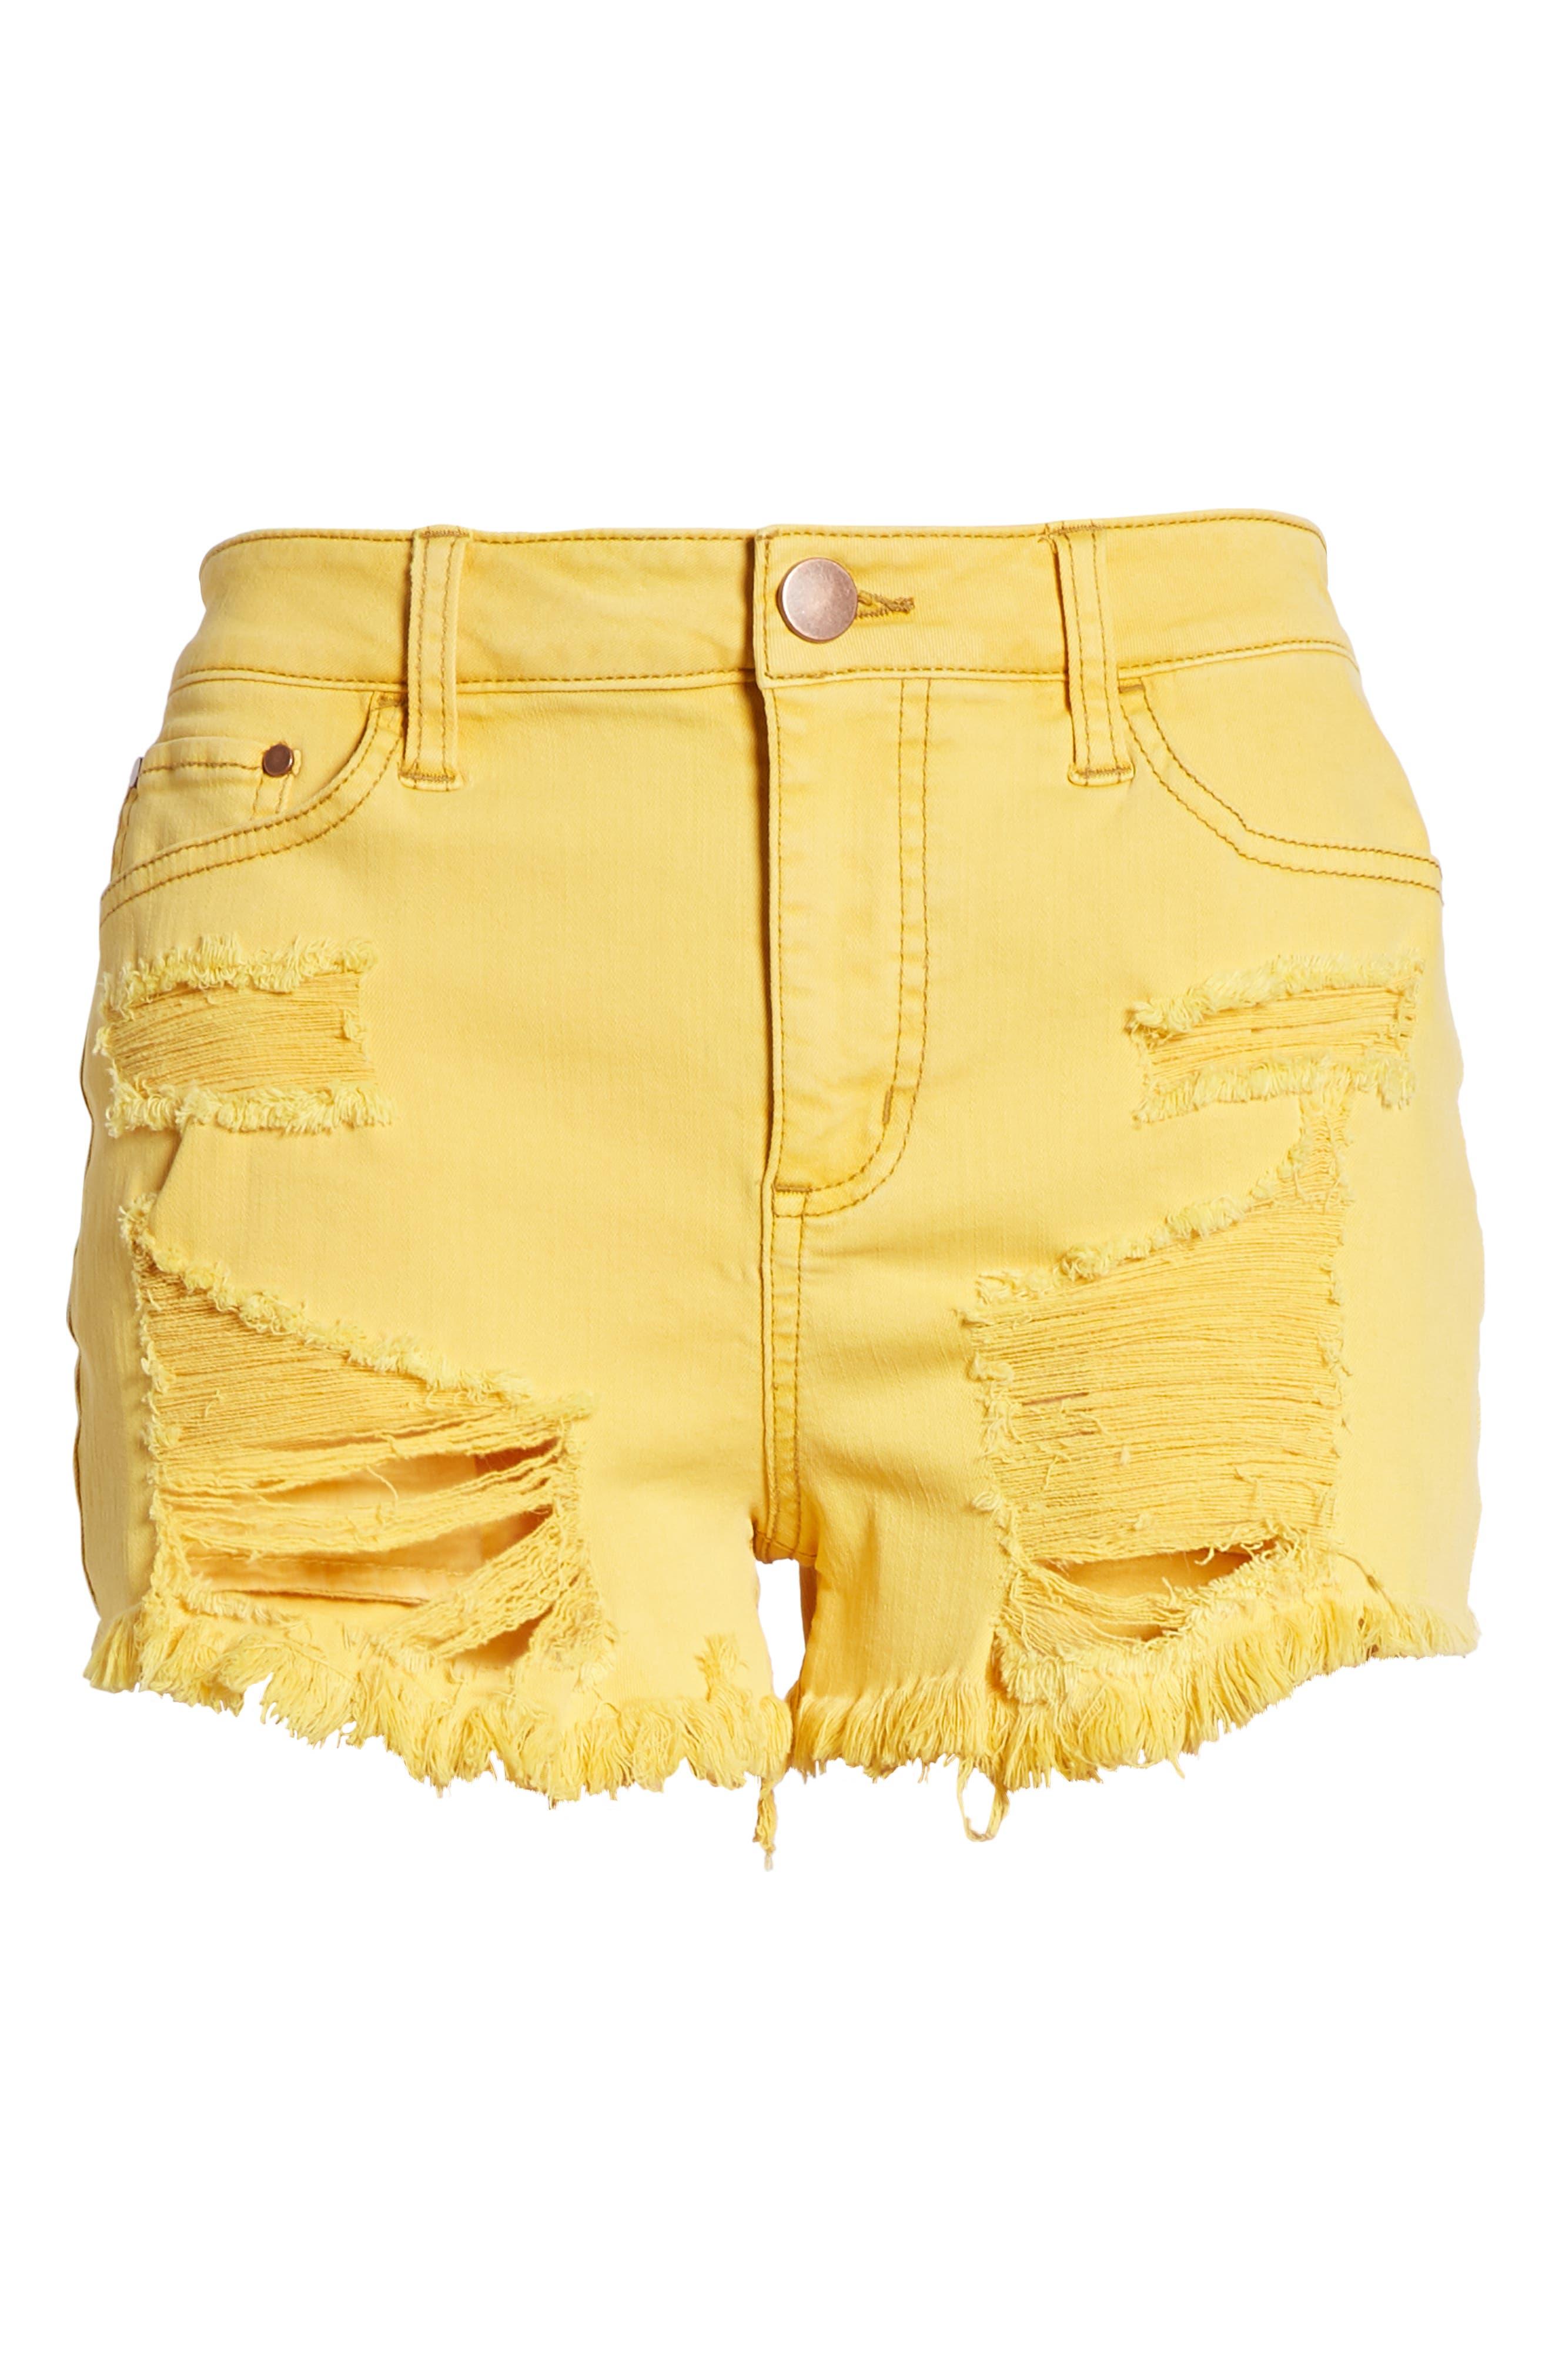 Decon Ripped Denim Shorts,                             Alternate thumbnail 7, color,                             Marigold